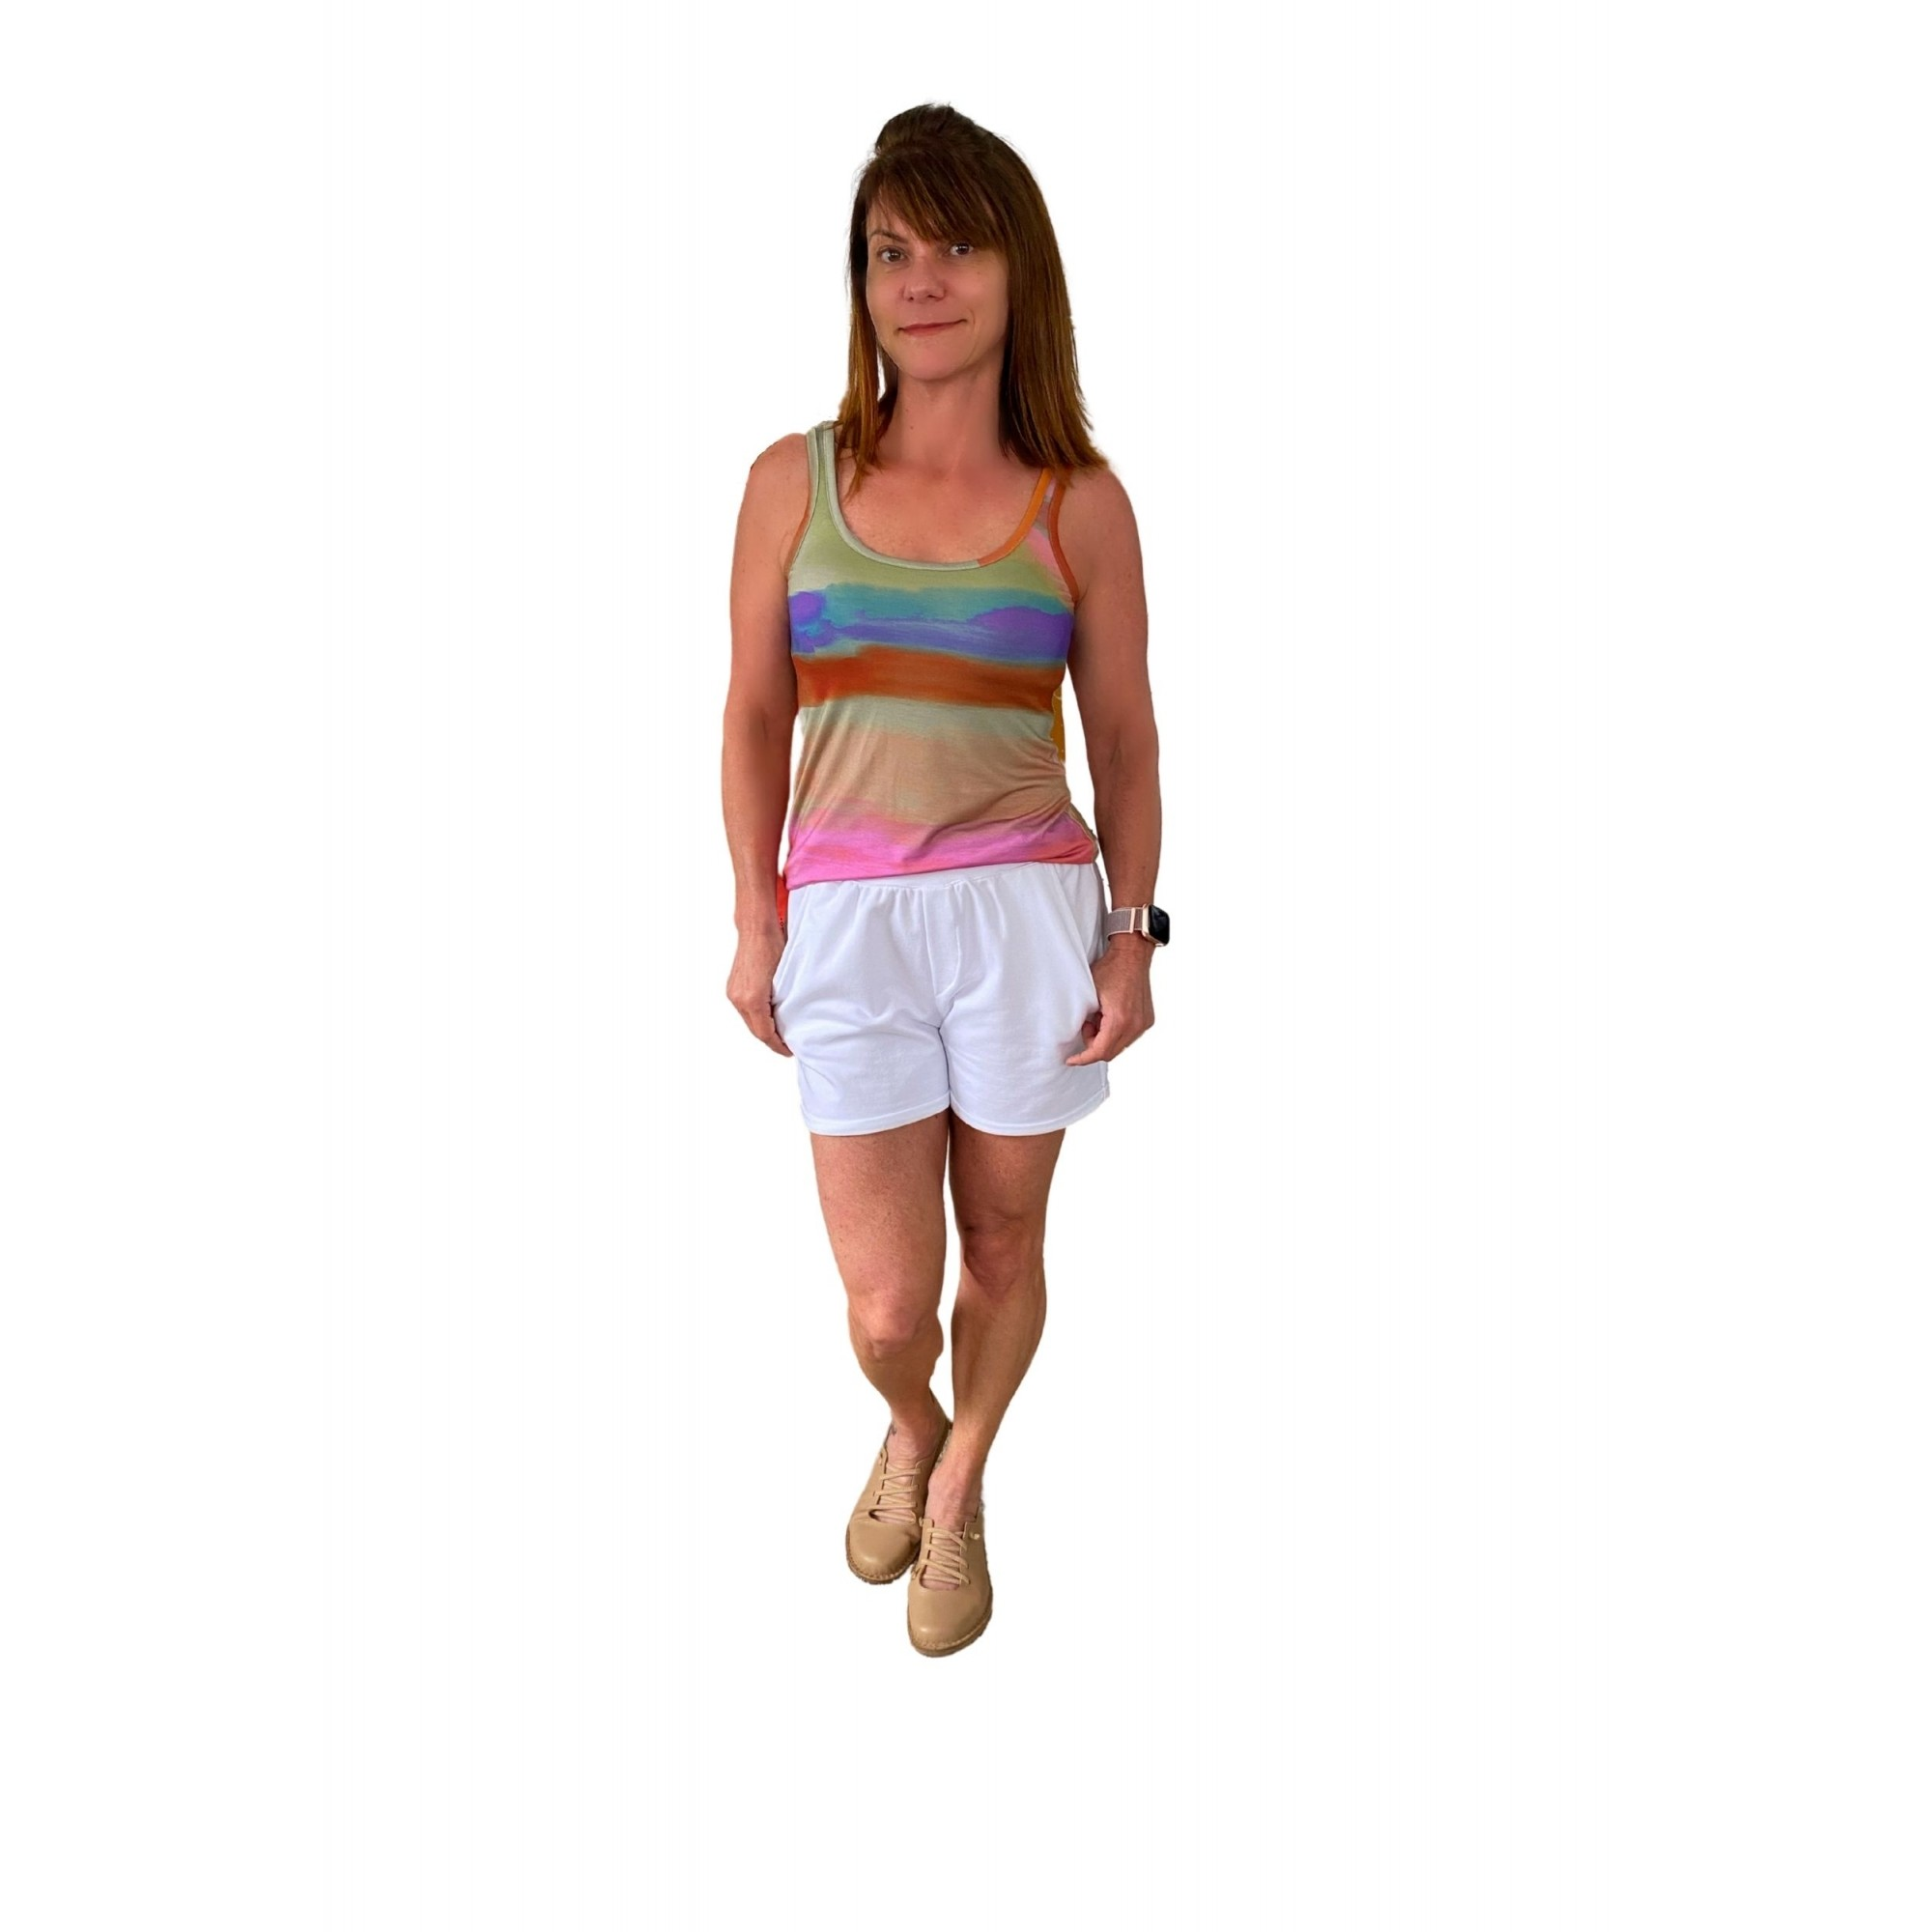 Camiseta Feminina Tie Dye